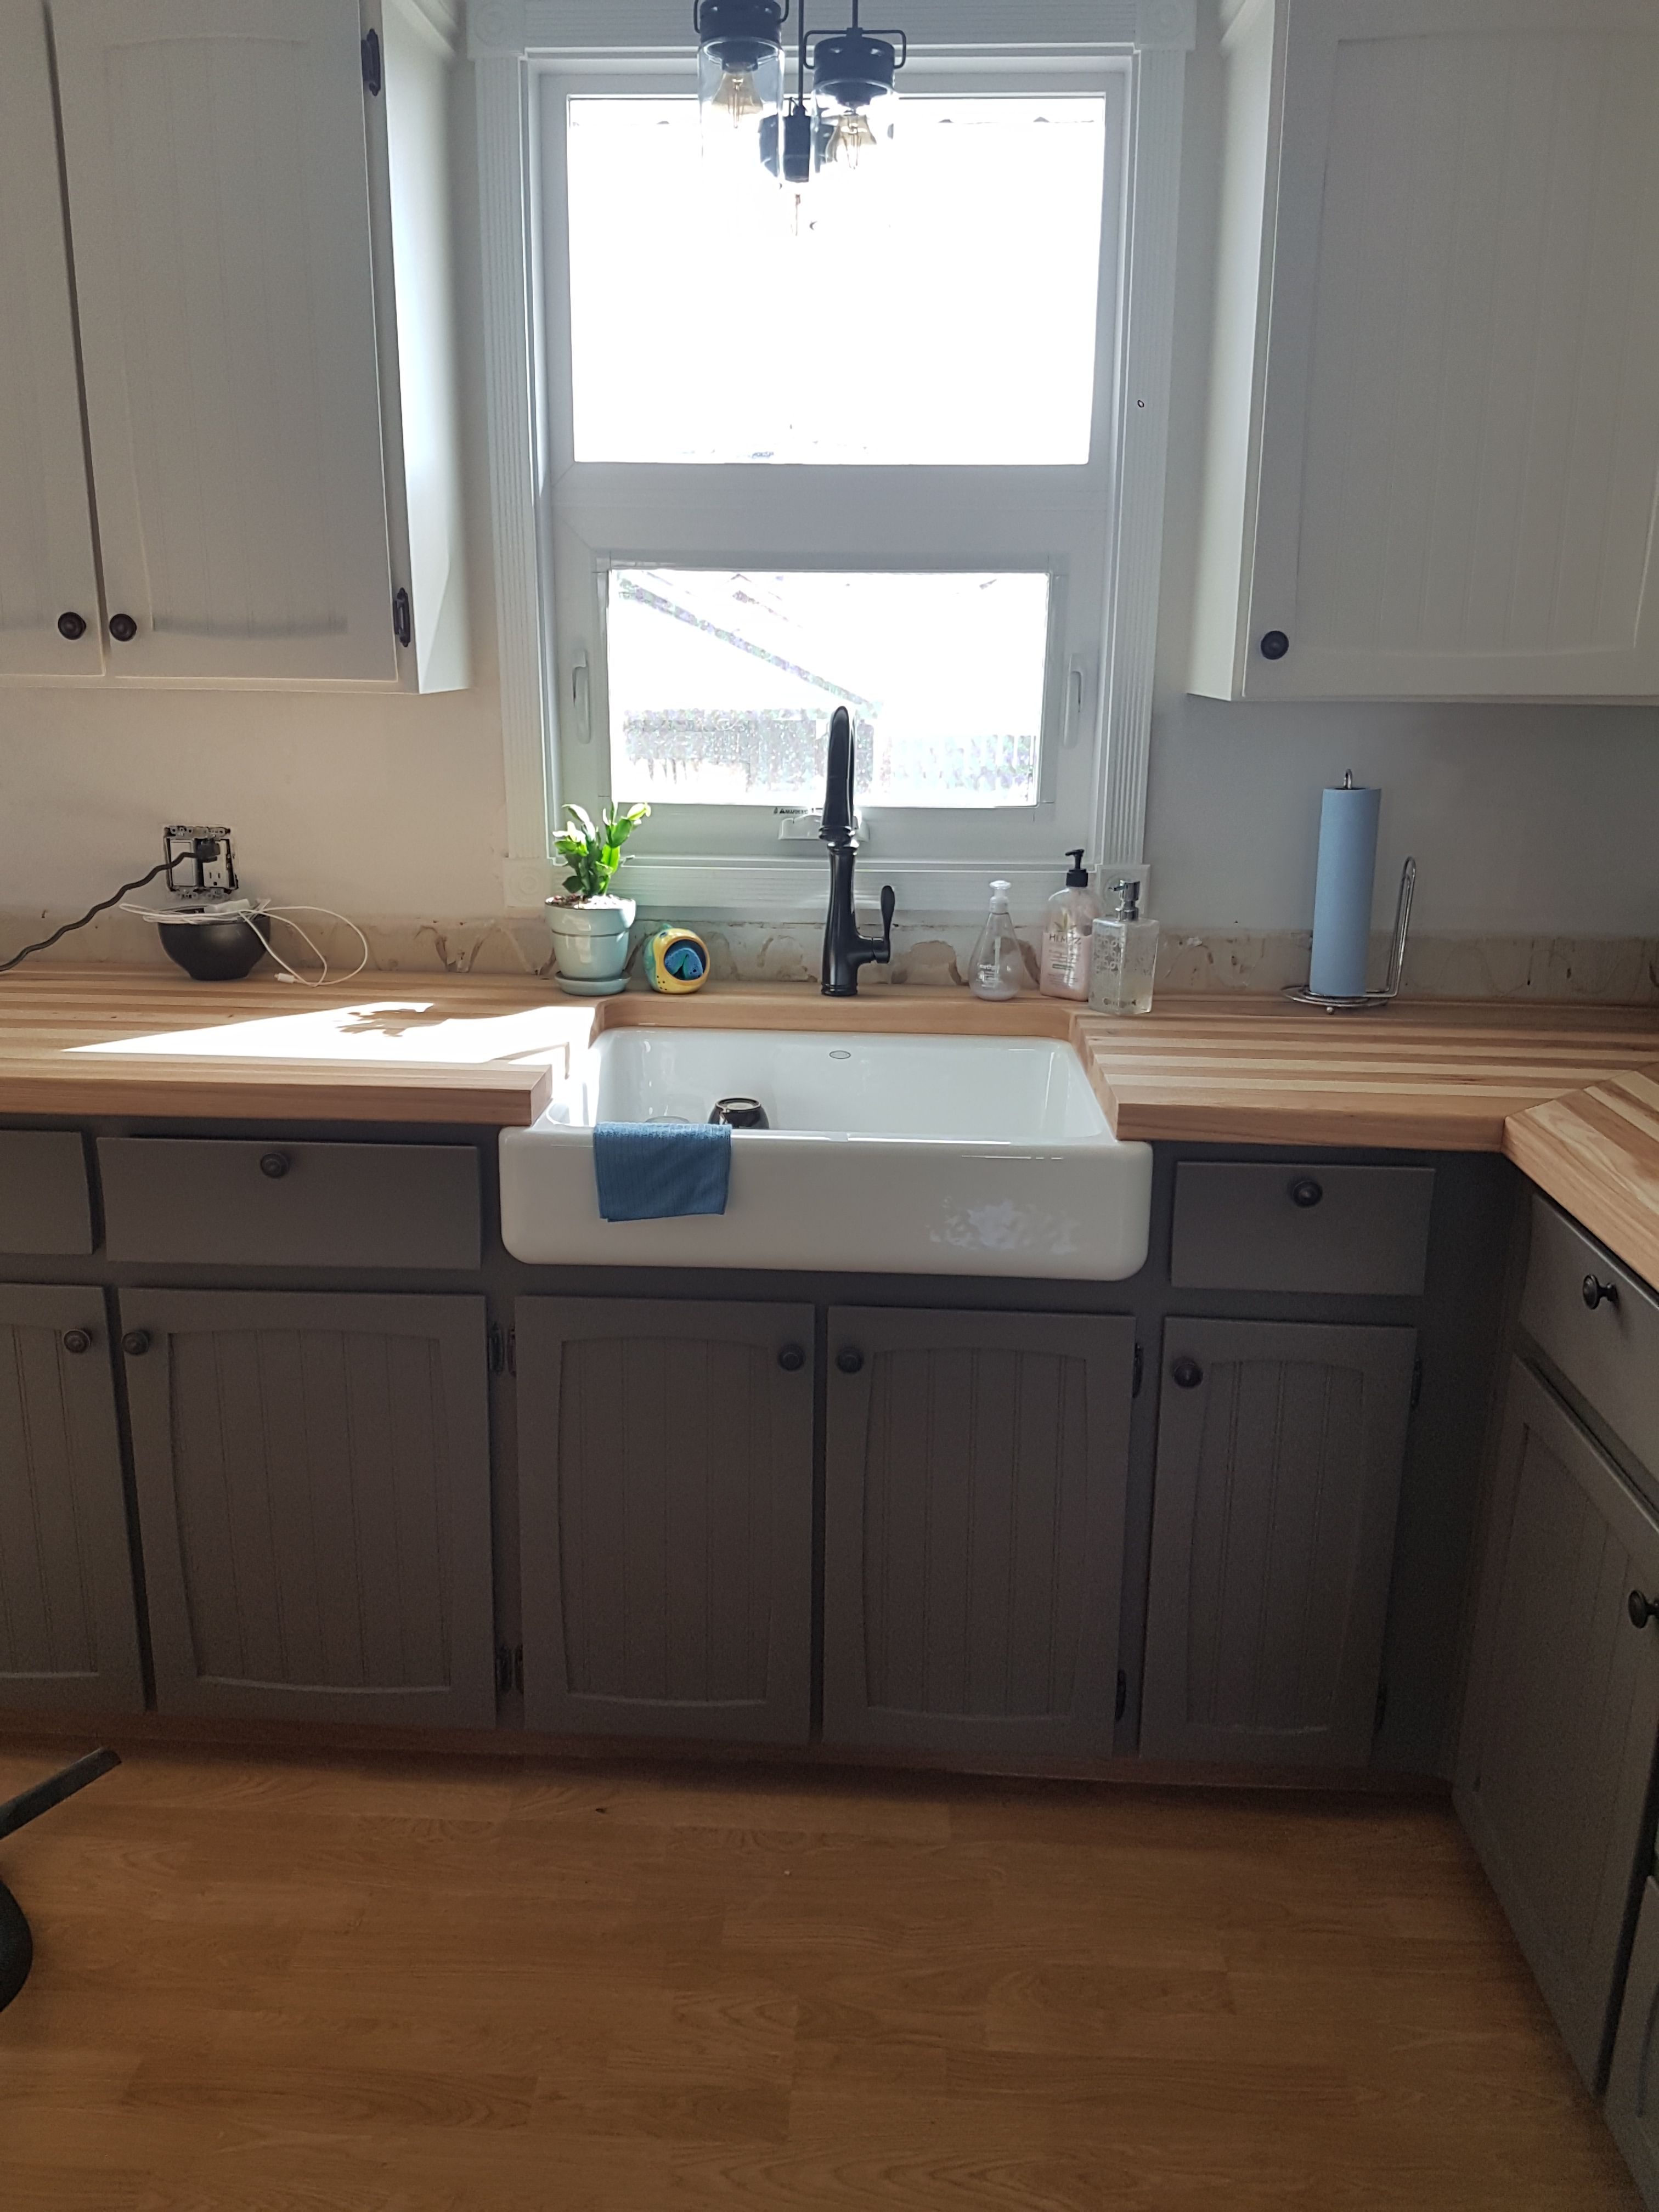 Next Generation Wood Countertop Certified Food Safe Totally Waterproof Maintenance Free